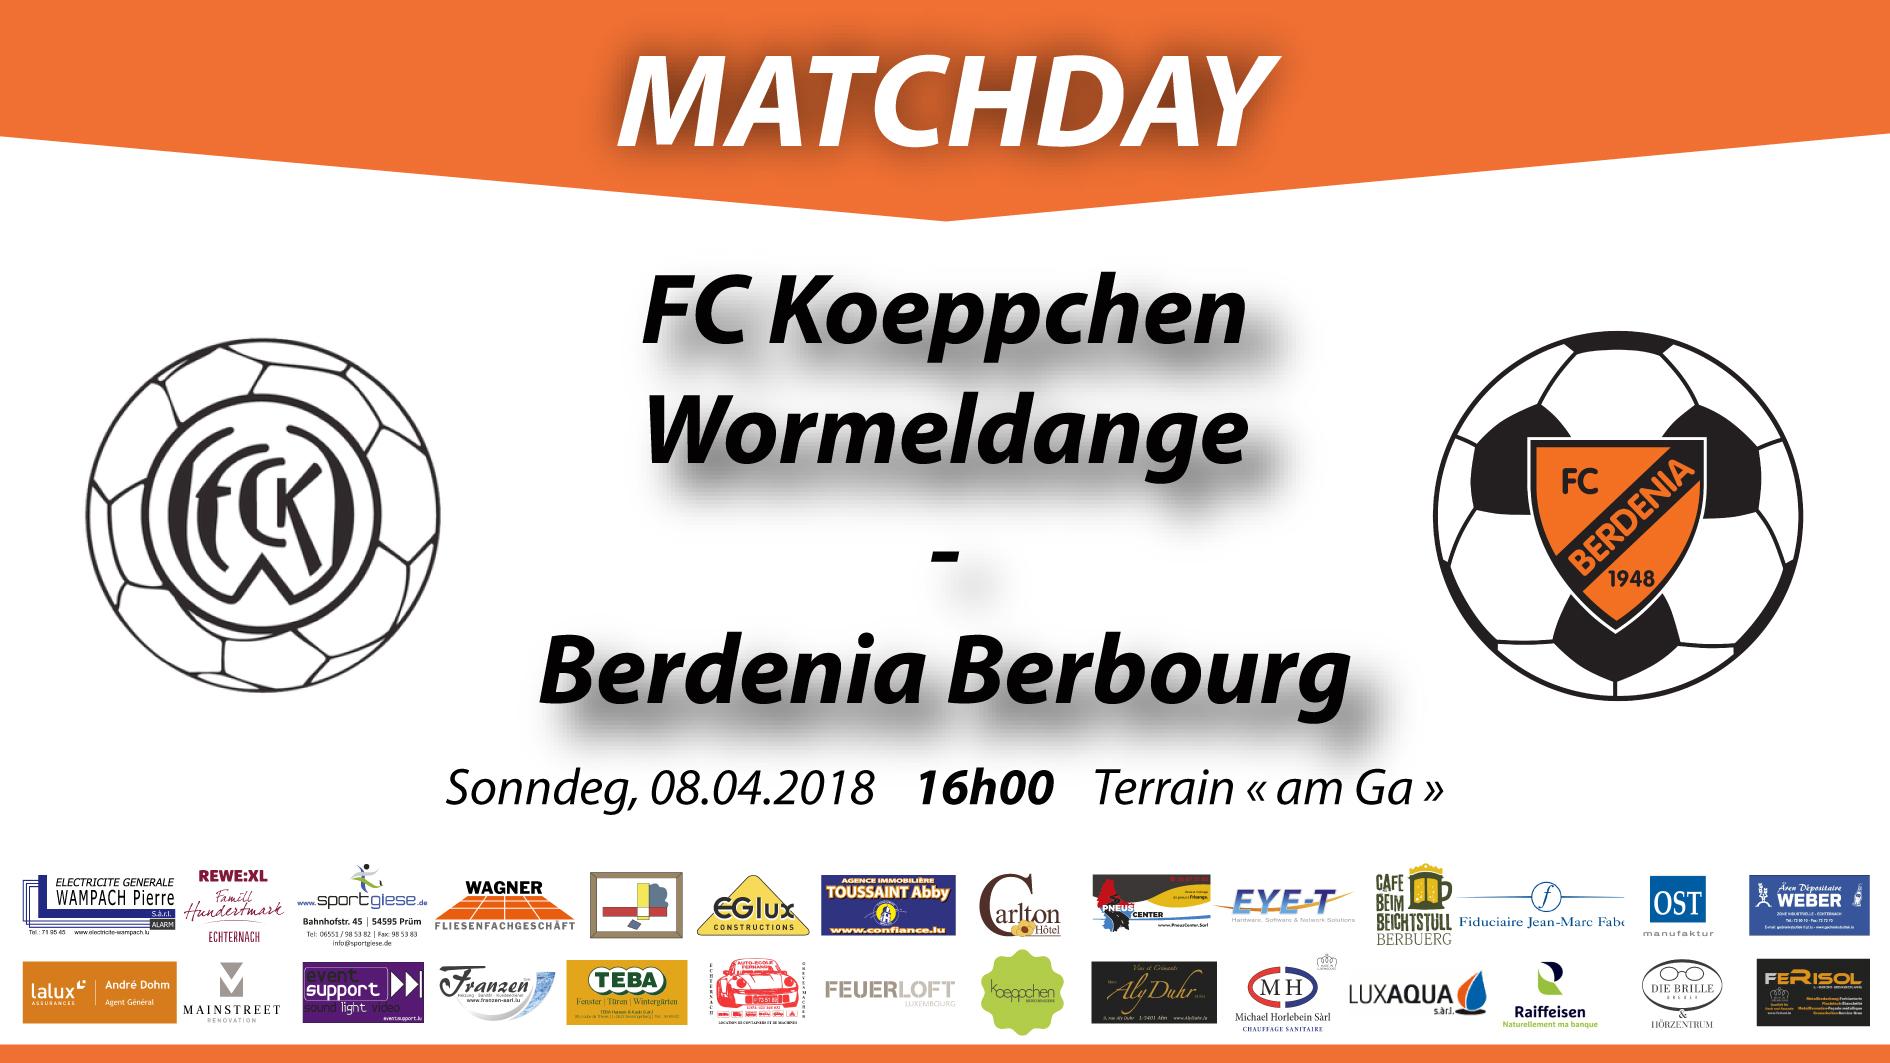 MATCHDAY: FC Koeppchen Wormeldange - FC Berdenia Berbourg